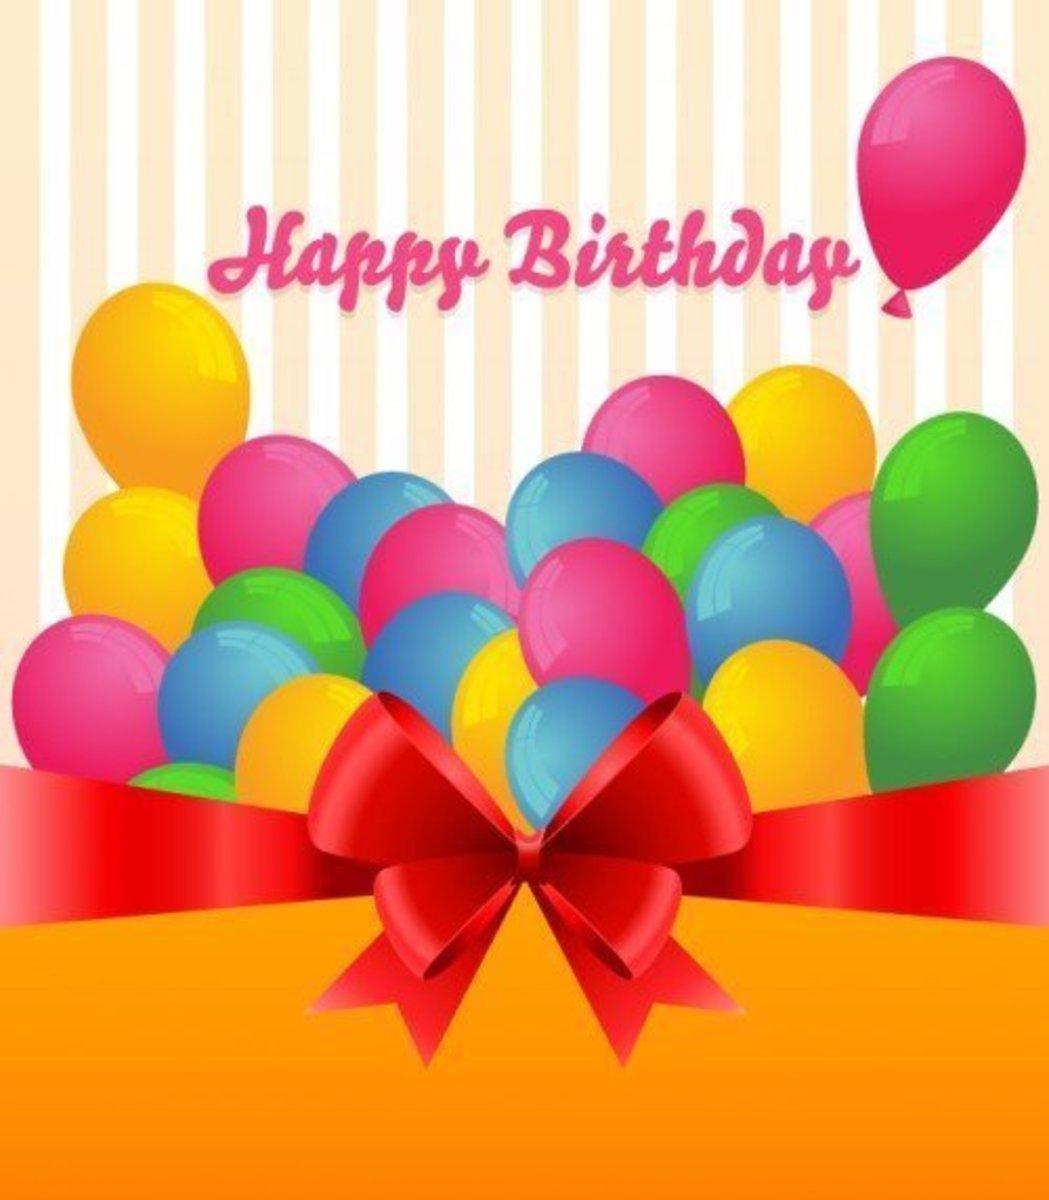 Happy Birthday, Present and Balloons